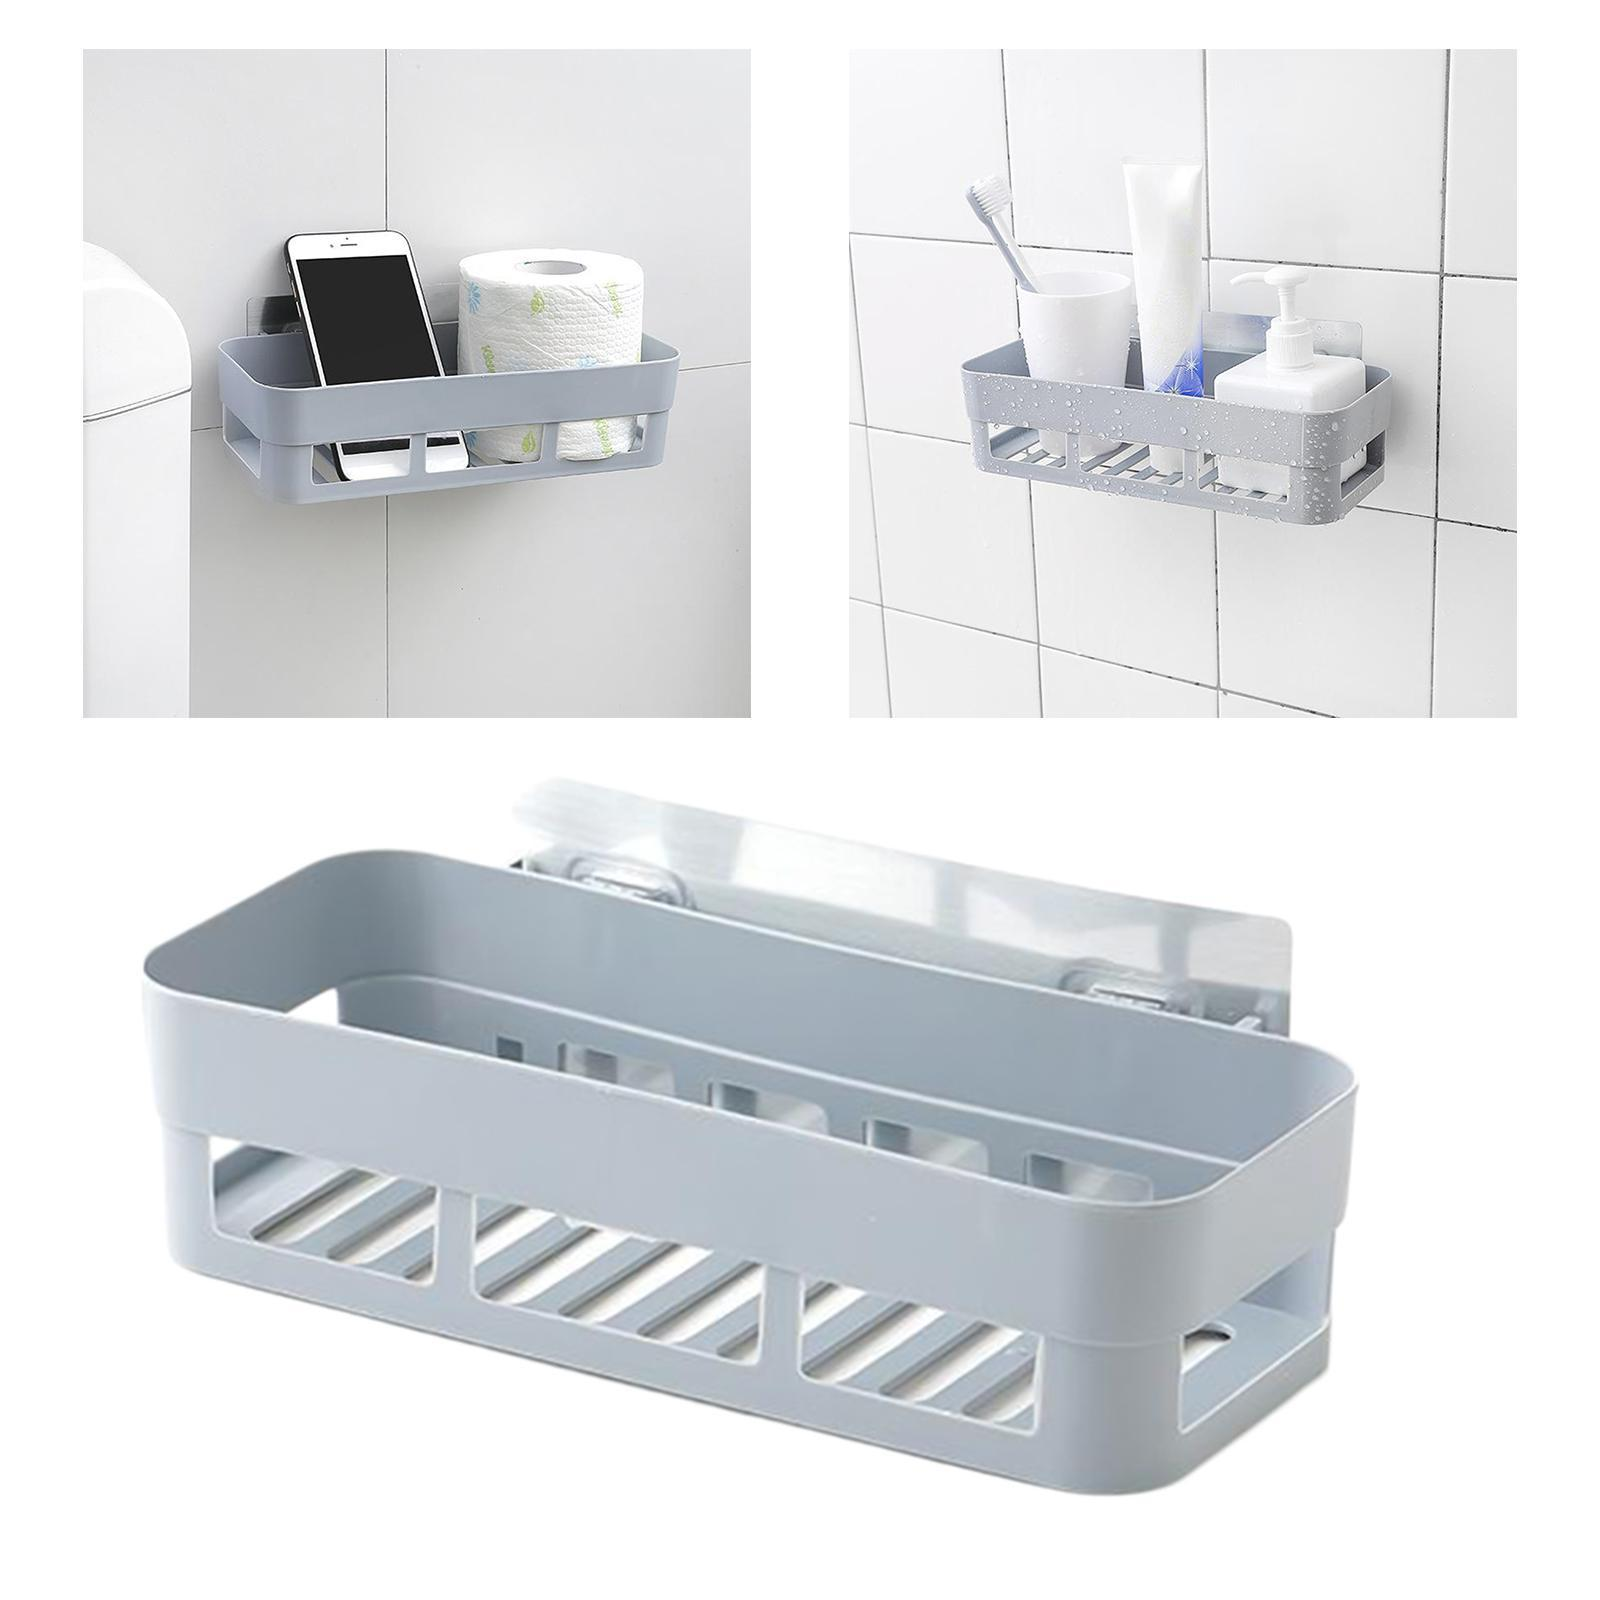 thumbnail 30 - Wall-Suction-Bathroom-Shelf-Shower-Caddy-Wall-Mount-Storage-Rack-Organizer